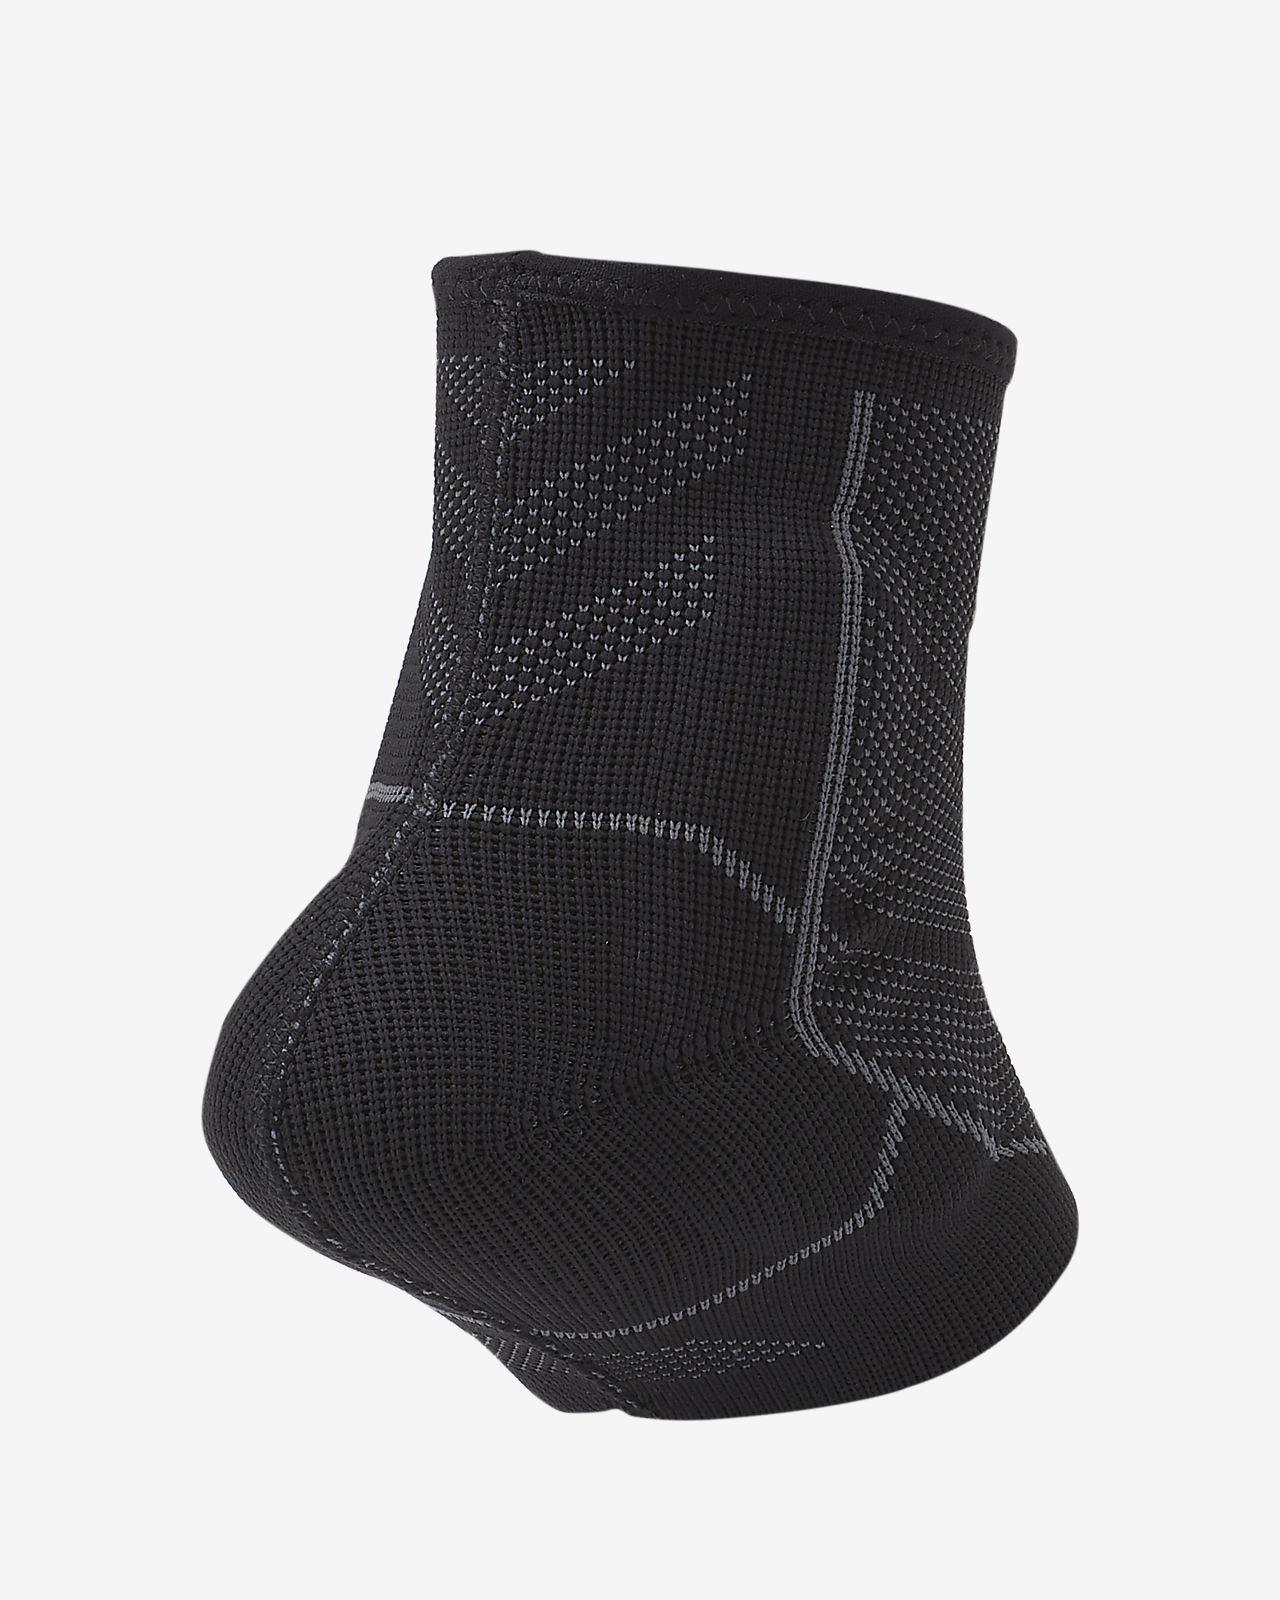 Nike Advantage Knitted 脚踝护套(1 只)